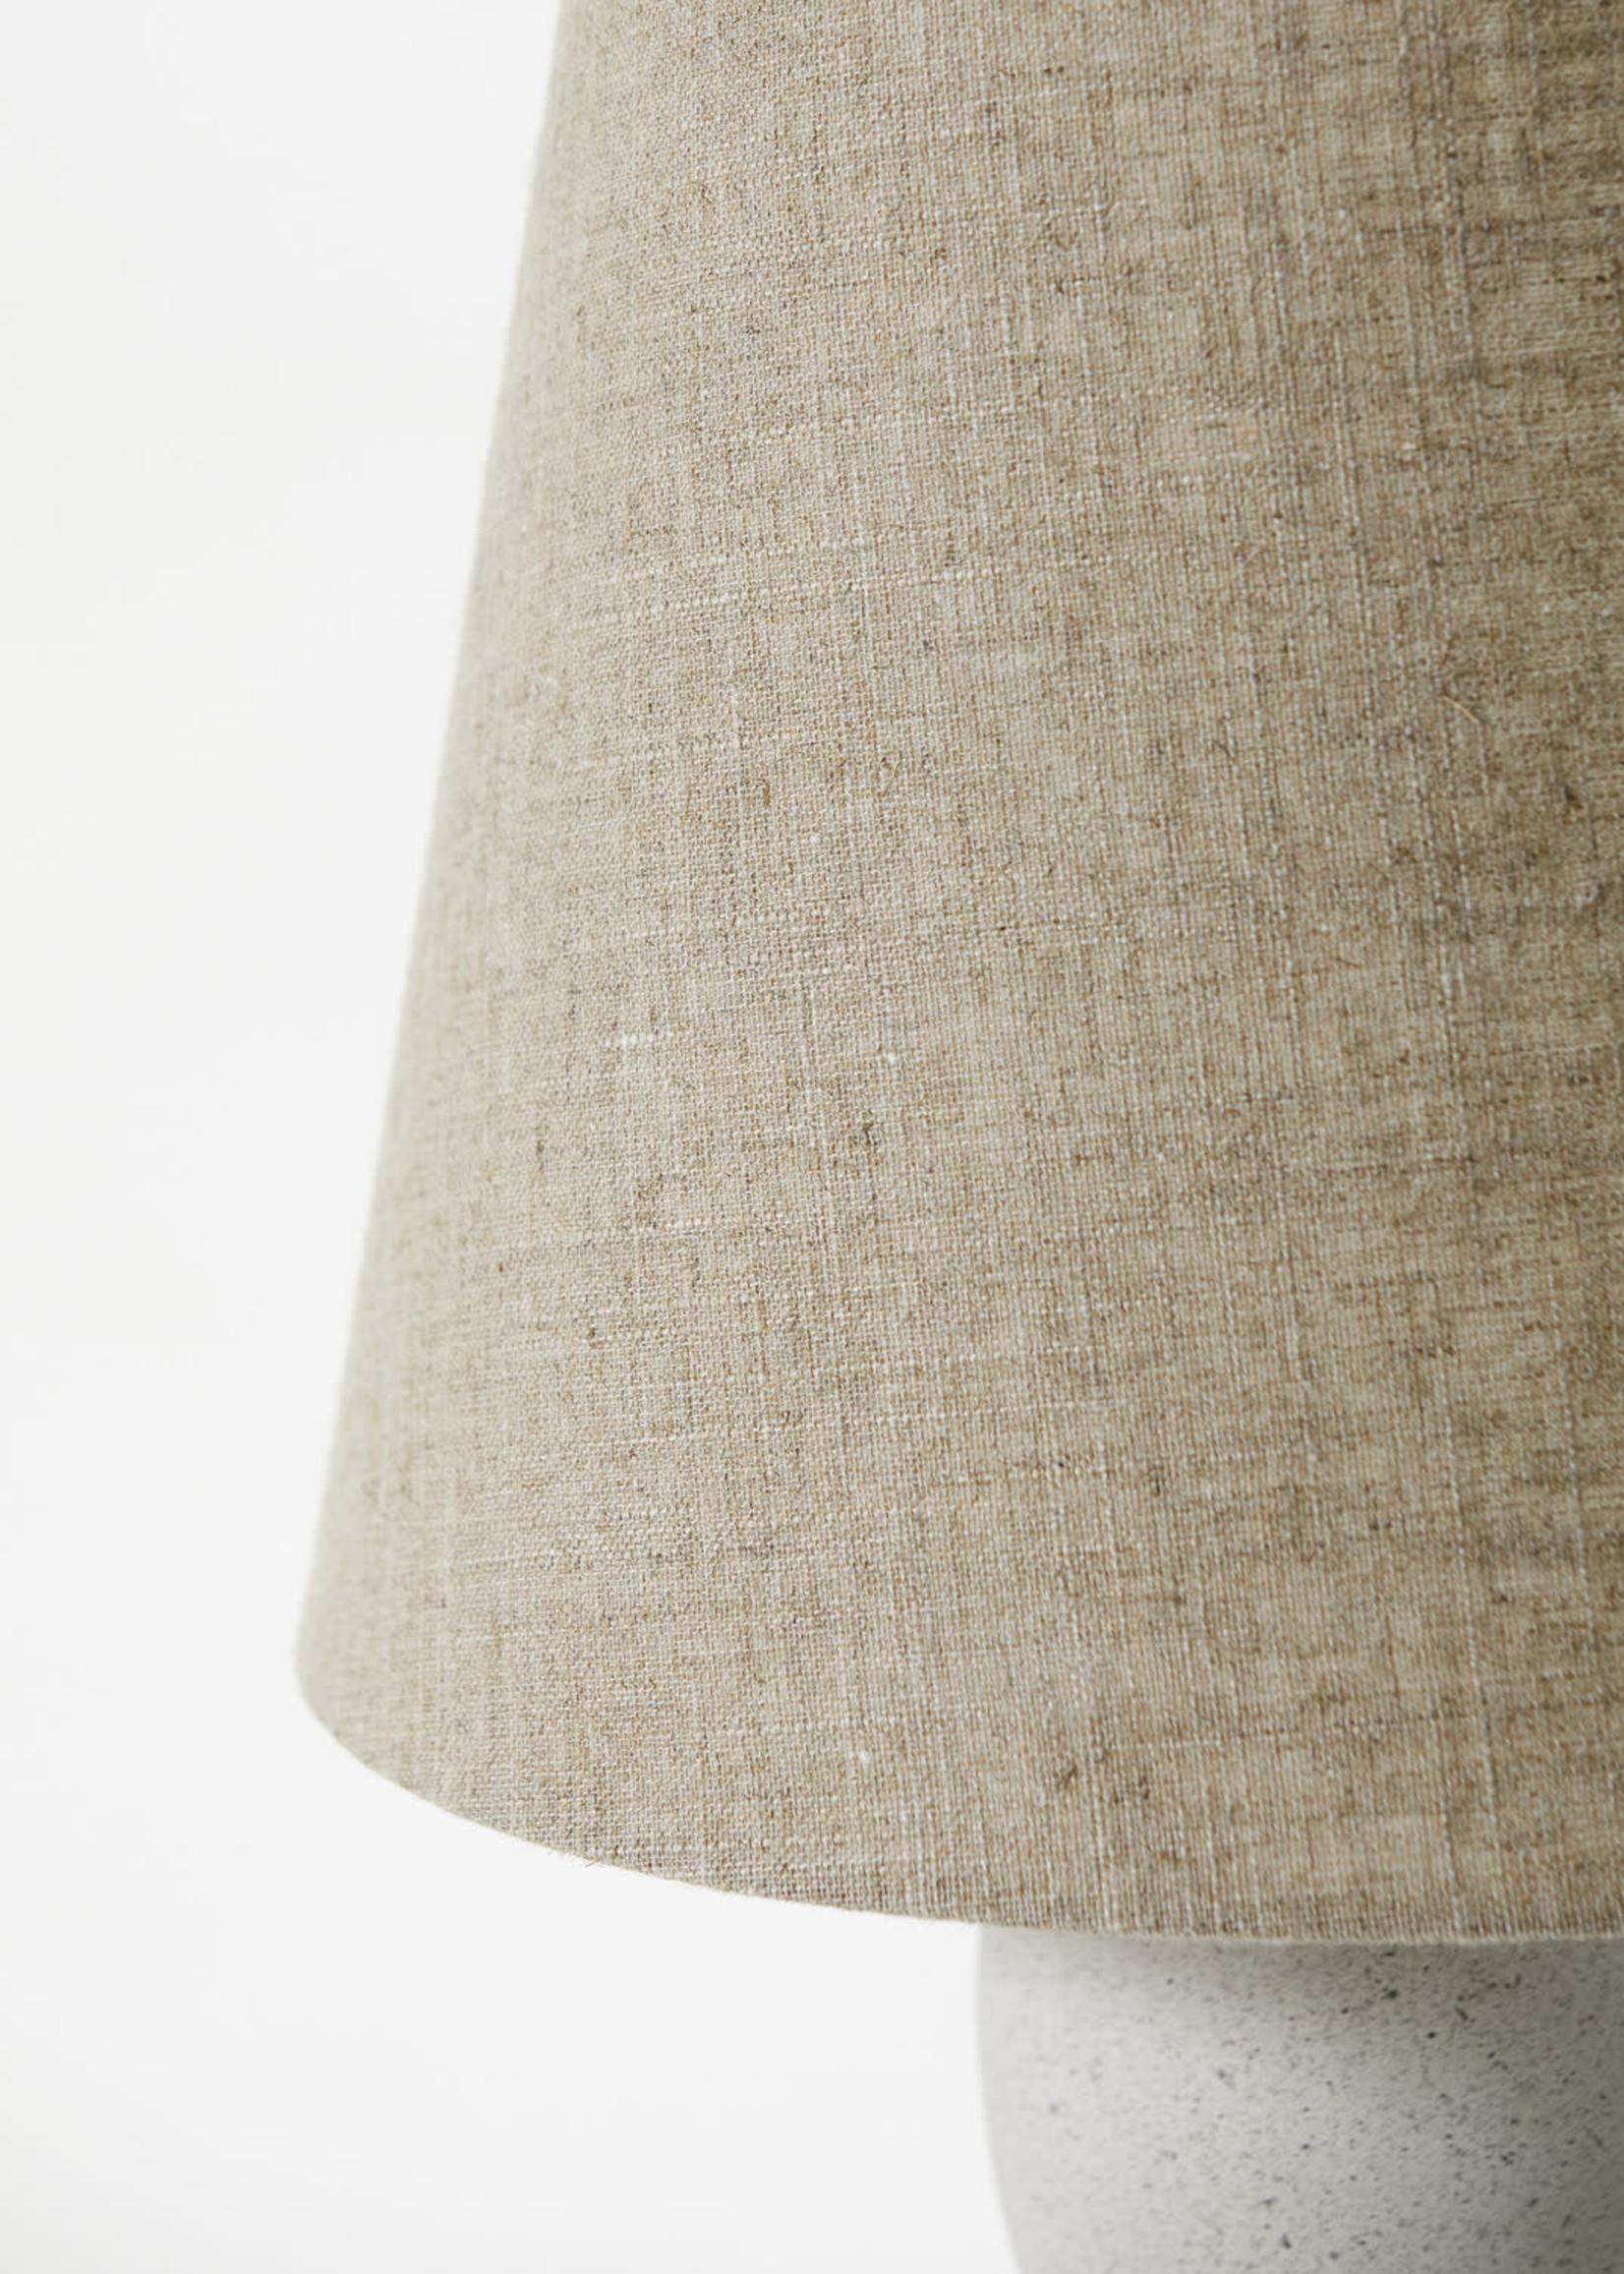 House Doctor Table lamp shade, Orga, Sand